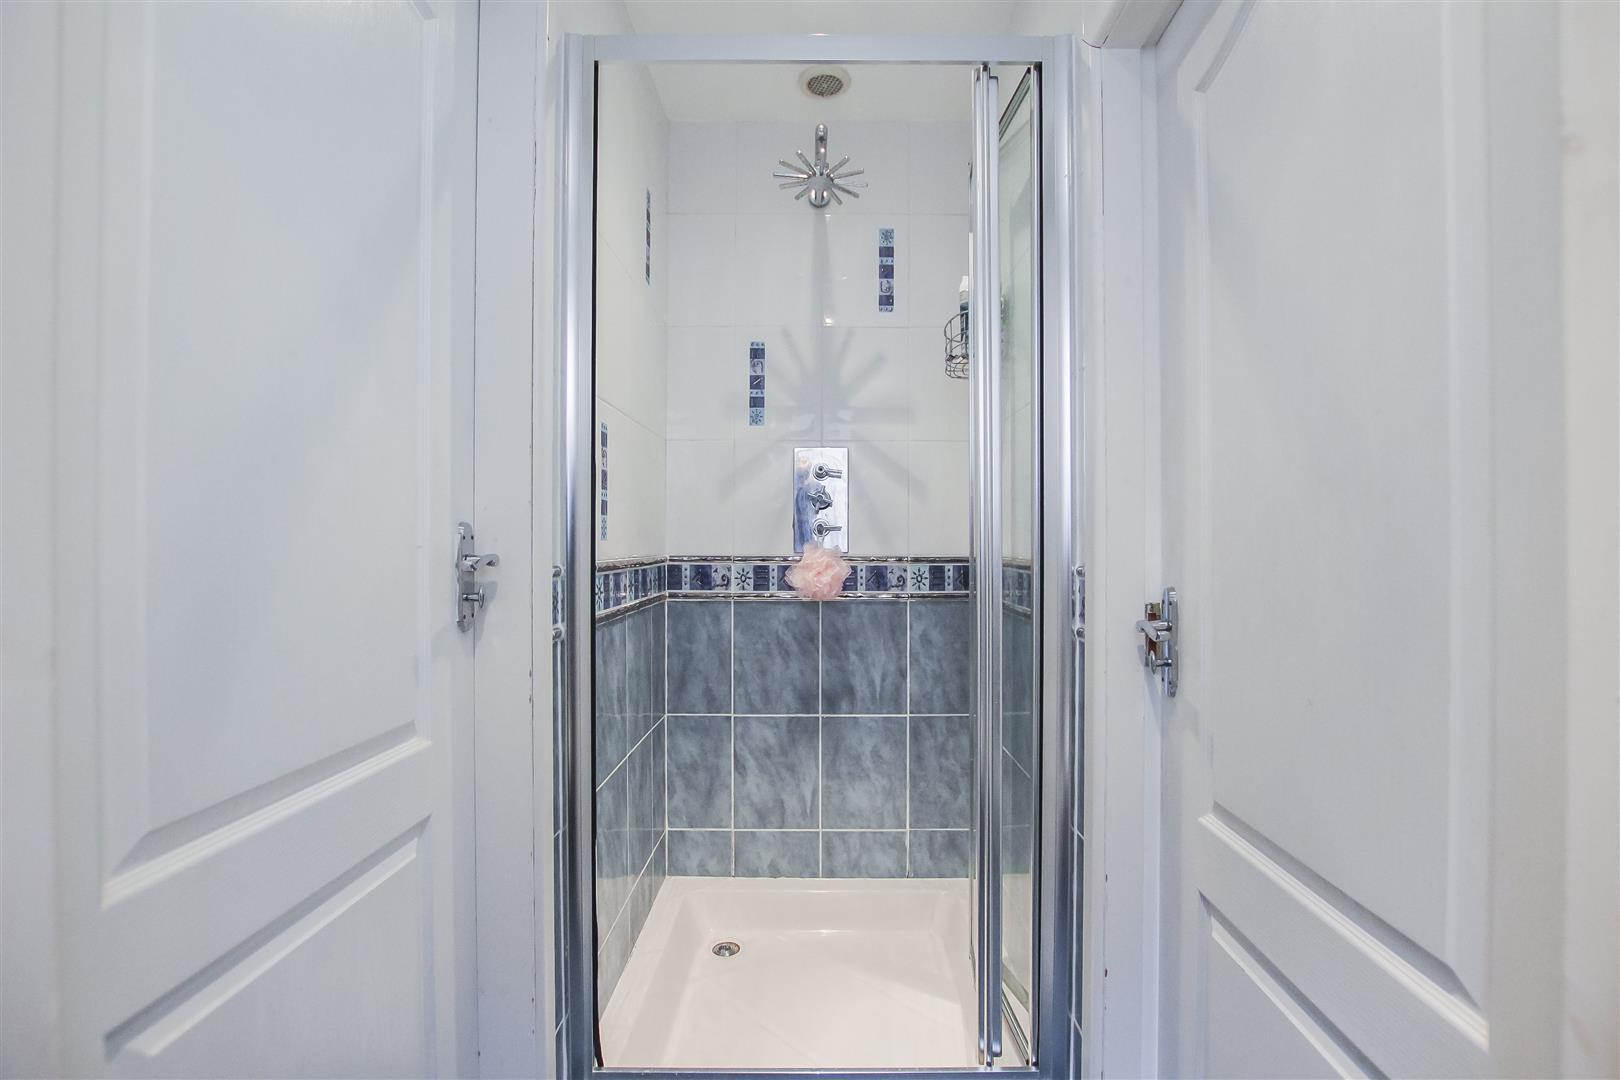 5 Bedroom Detached House For Sale - Jack and Jill Shower Room